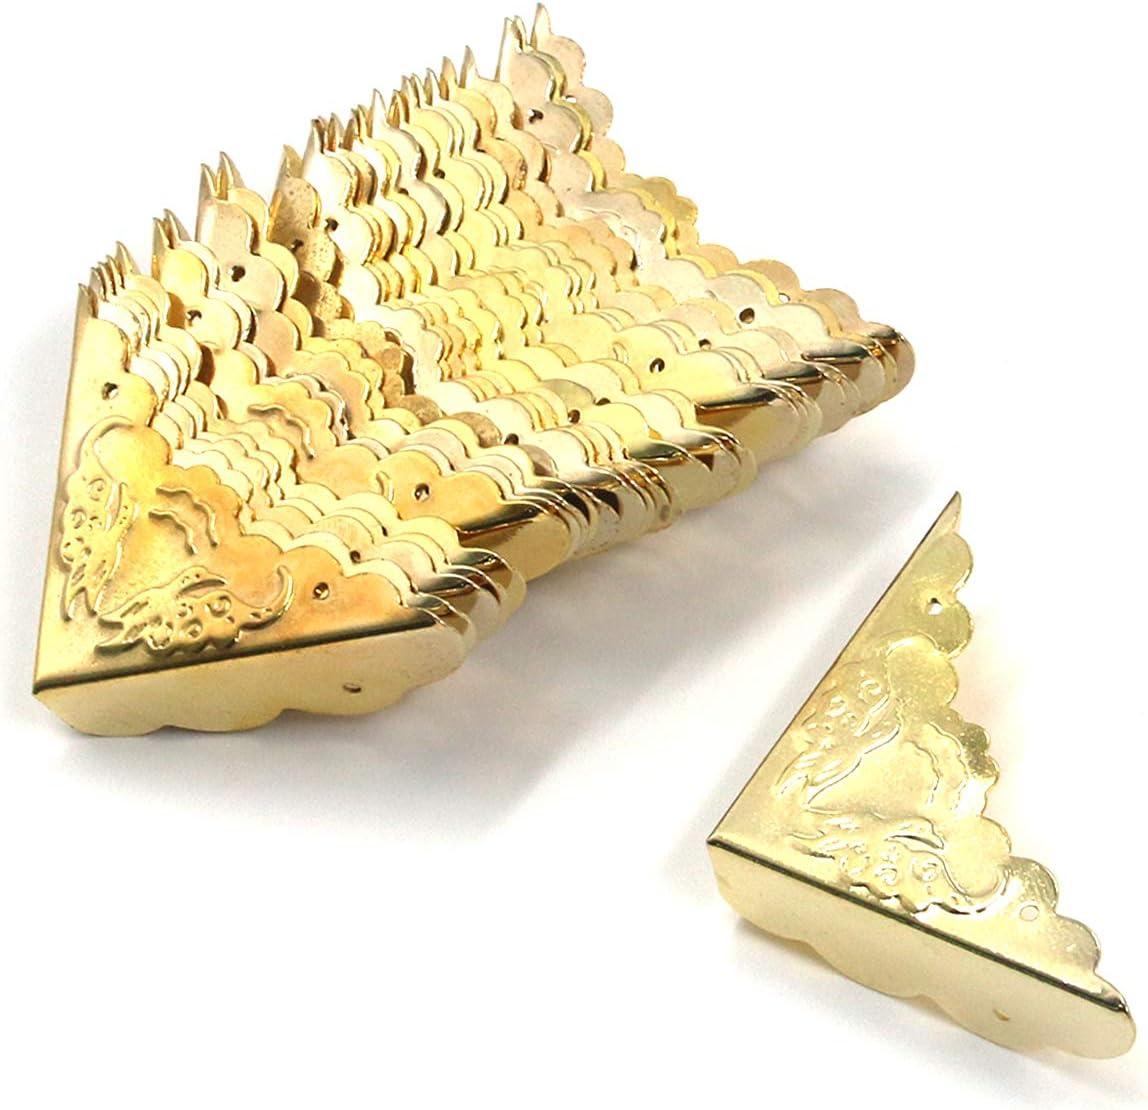 "Antrader Antique Decorative Box Corner Protector Edge Safety Furniture Corner Guard, 1.6"" x 1.6"" Gold Tone, Pack of 24"